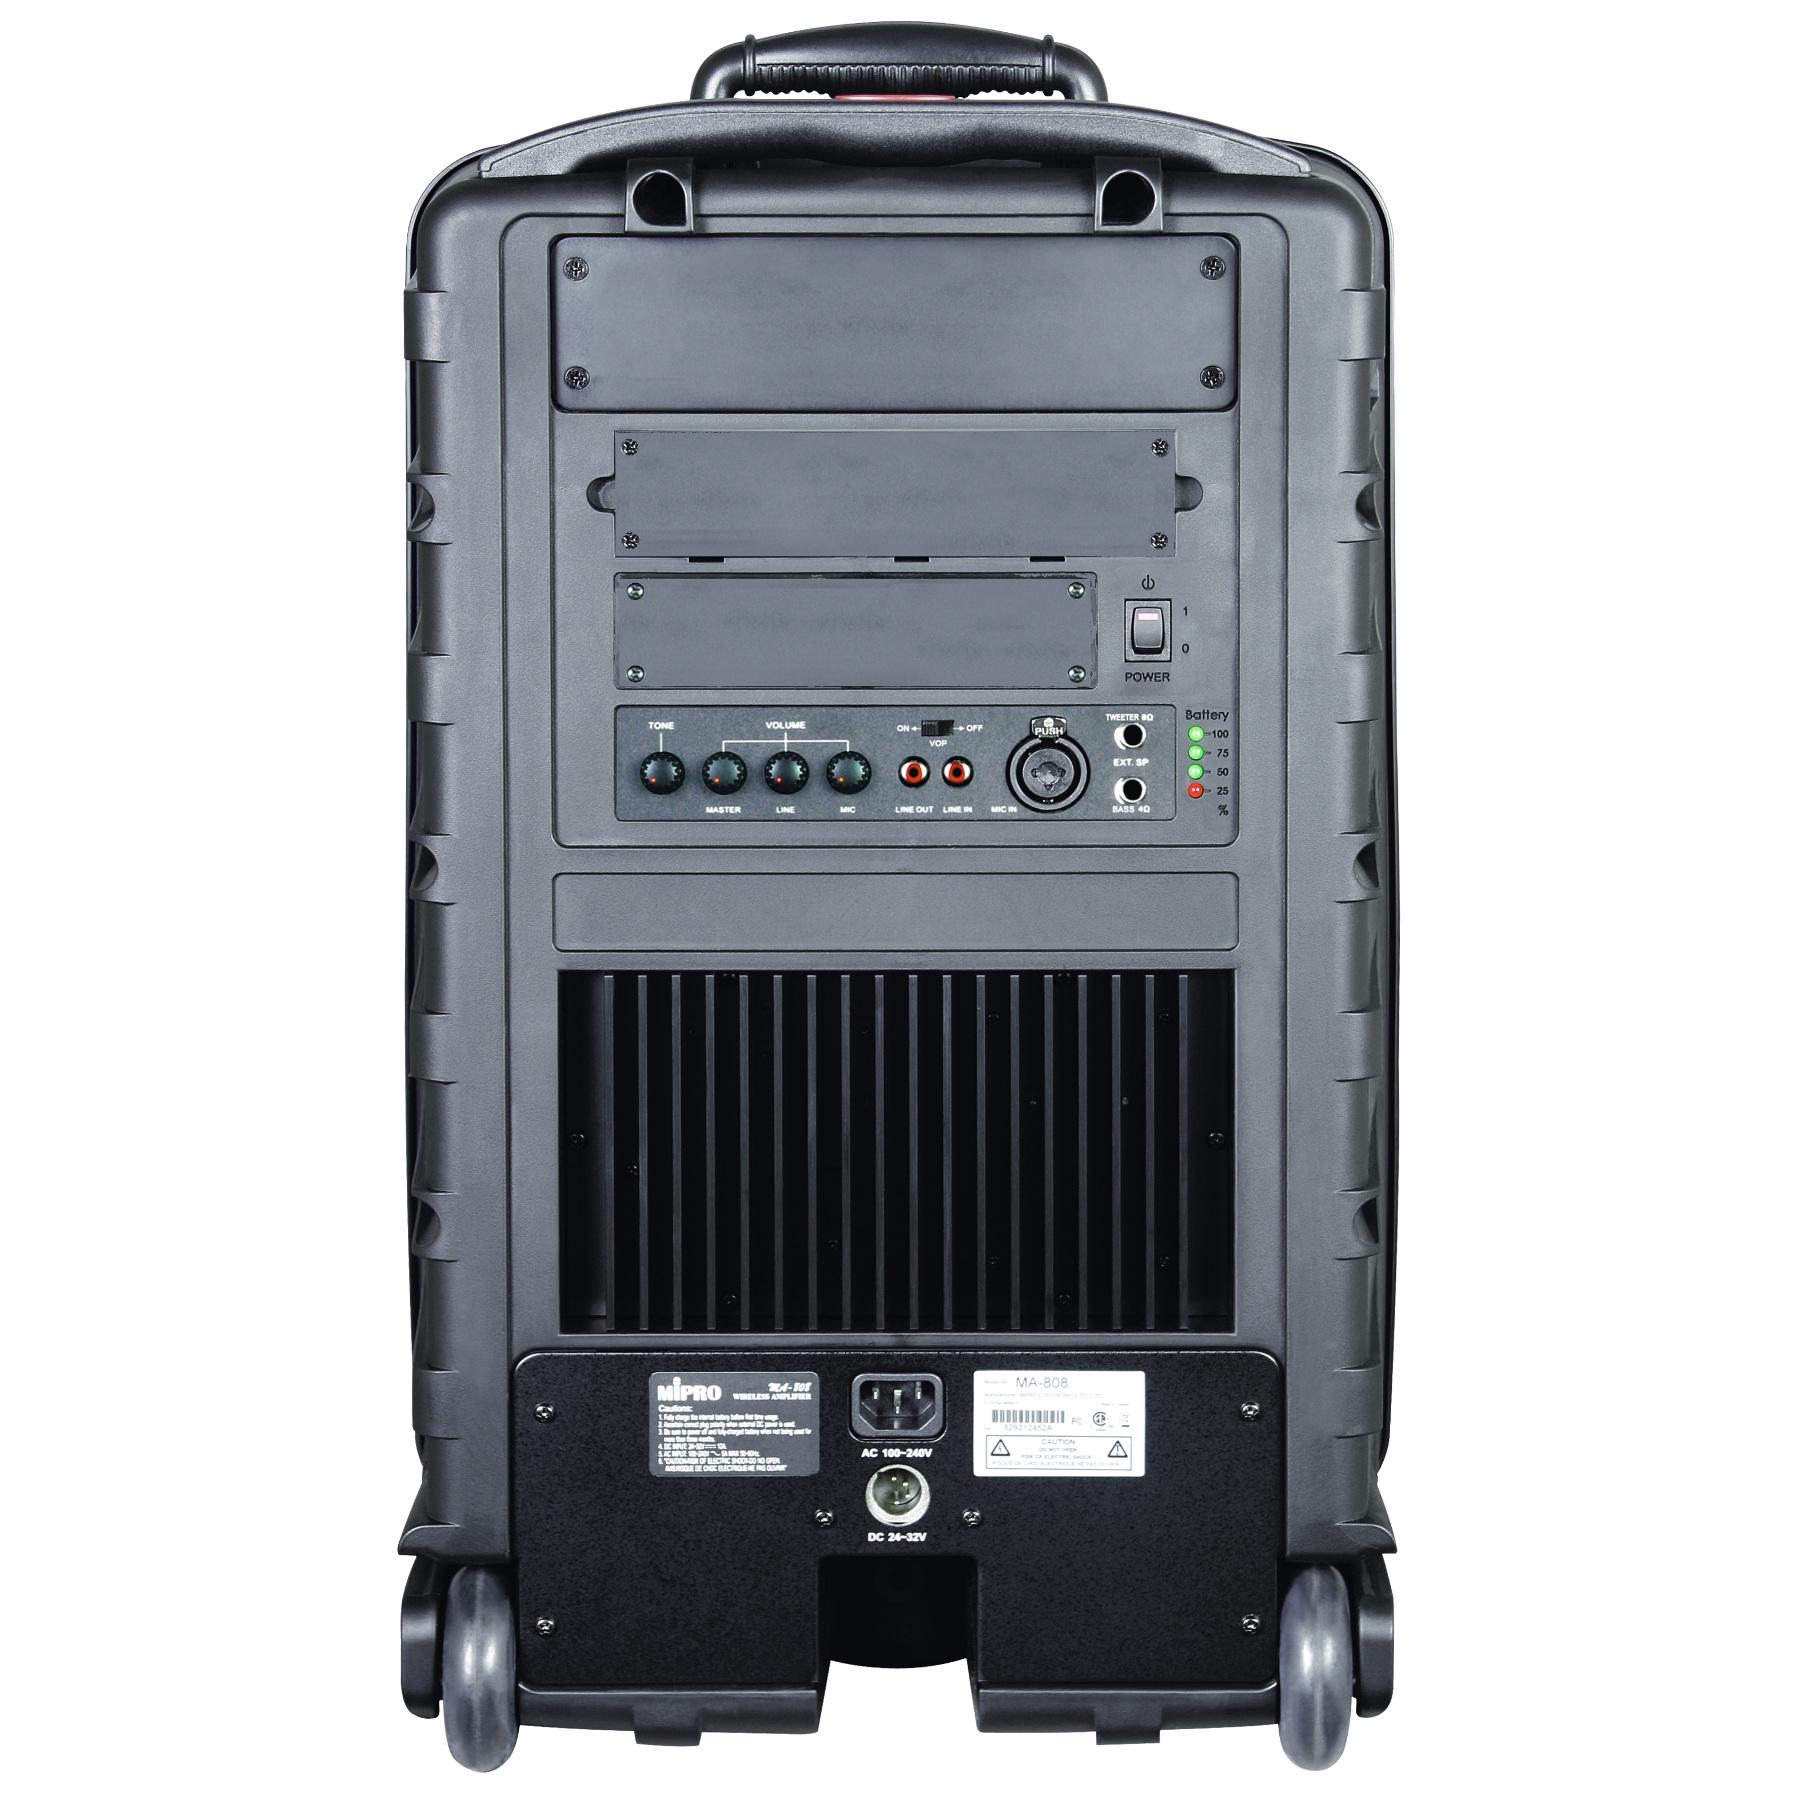 Portable Wireless PA System, 267 Watts